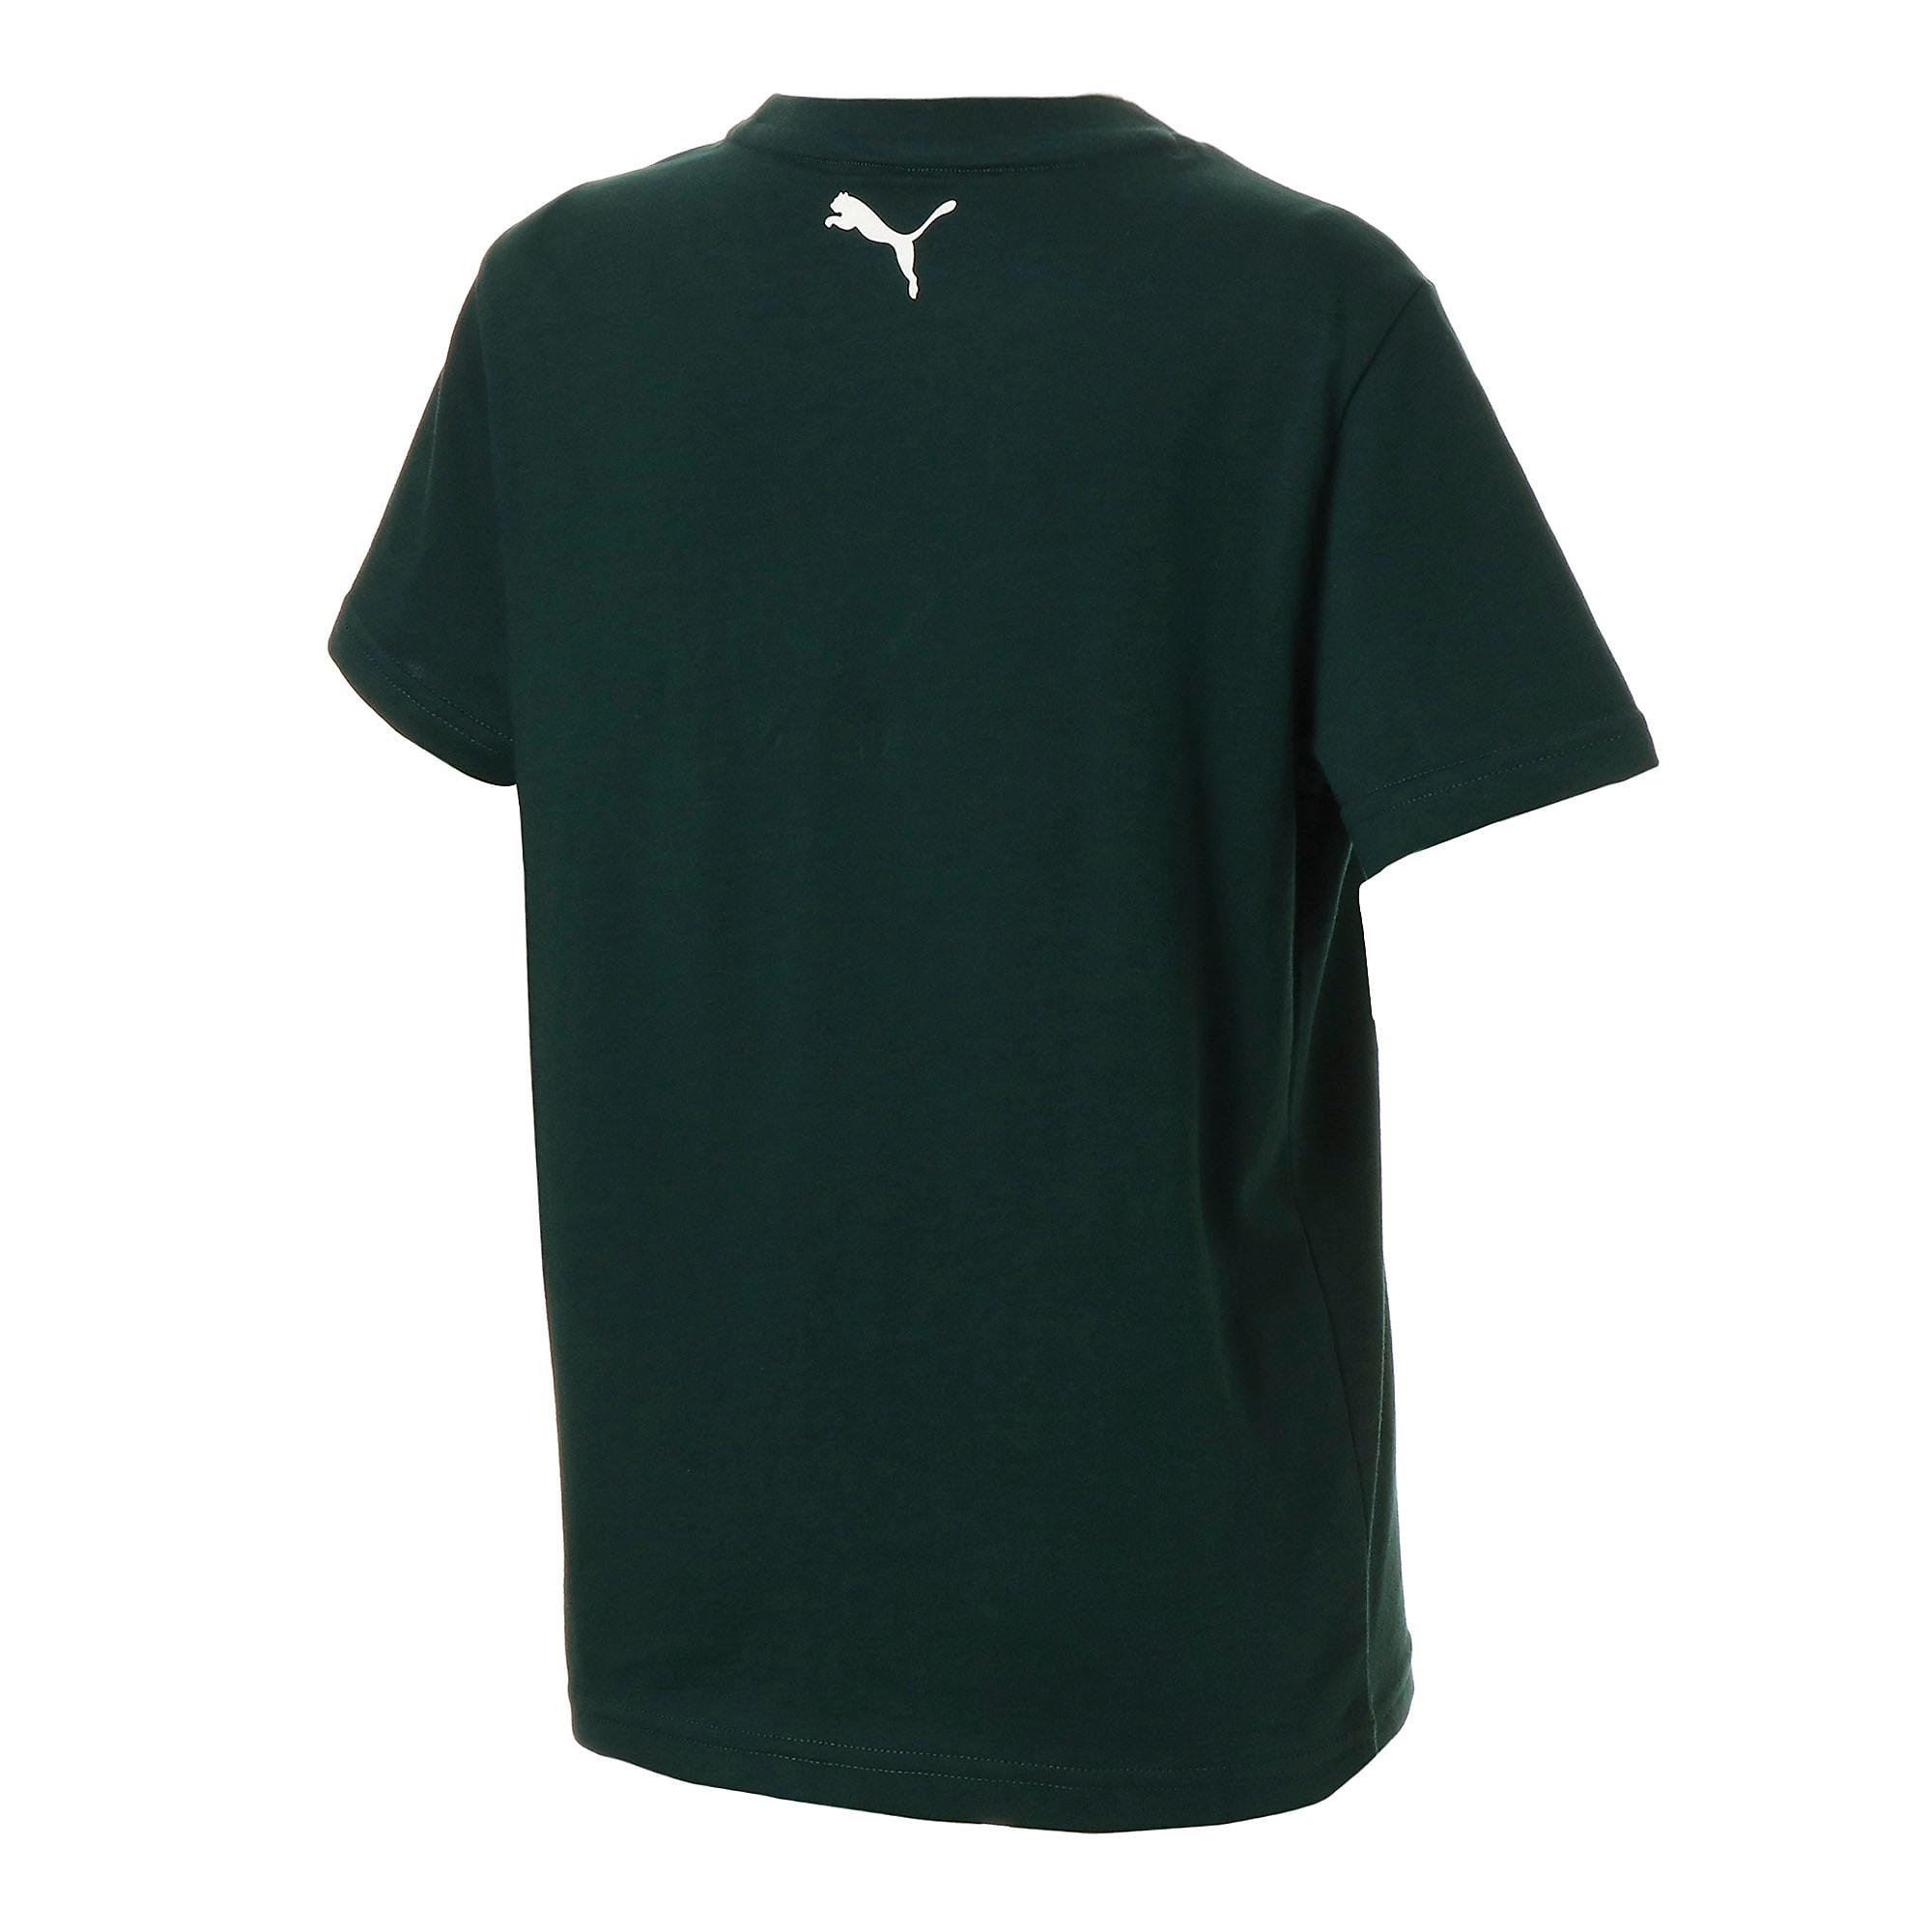 Thumbnail 3 of キッズ ALPHA SS グラフィック Tシャツ 半袖, Ponderosa Pine, medium-JPN